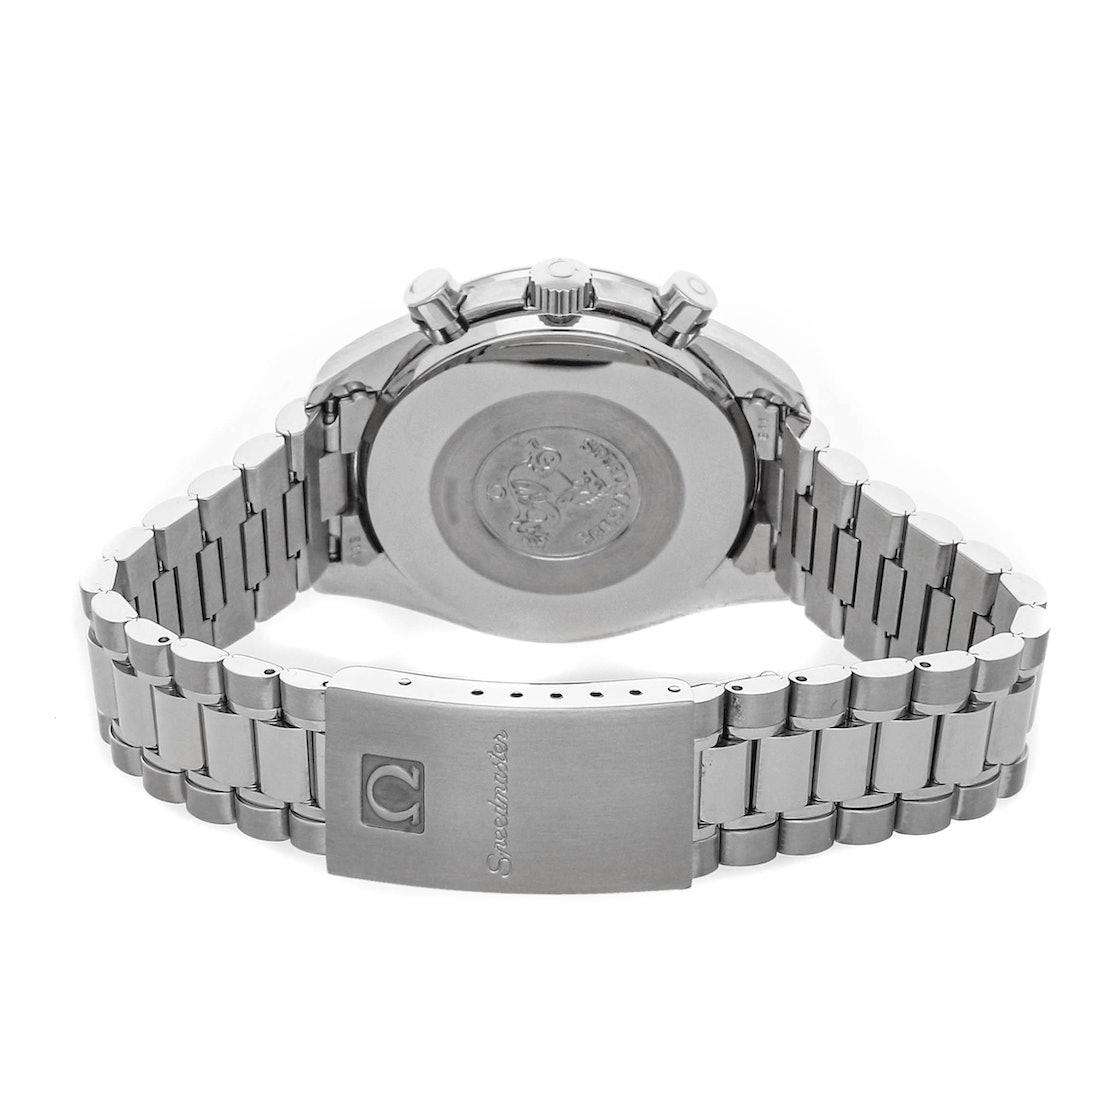 Omega Speedmaster Chronograph 3510.12.00